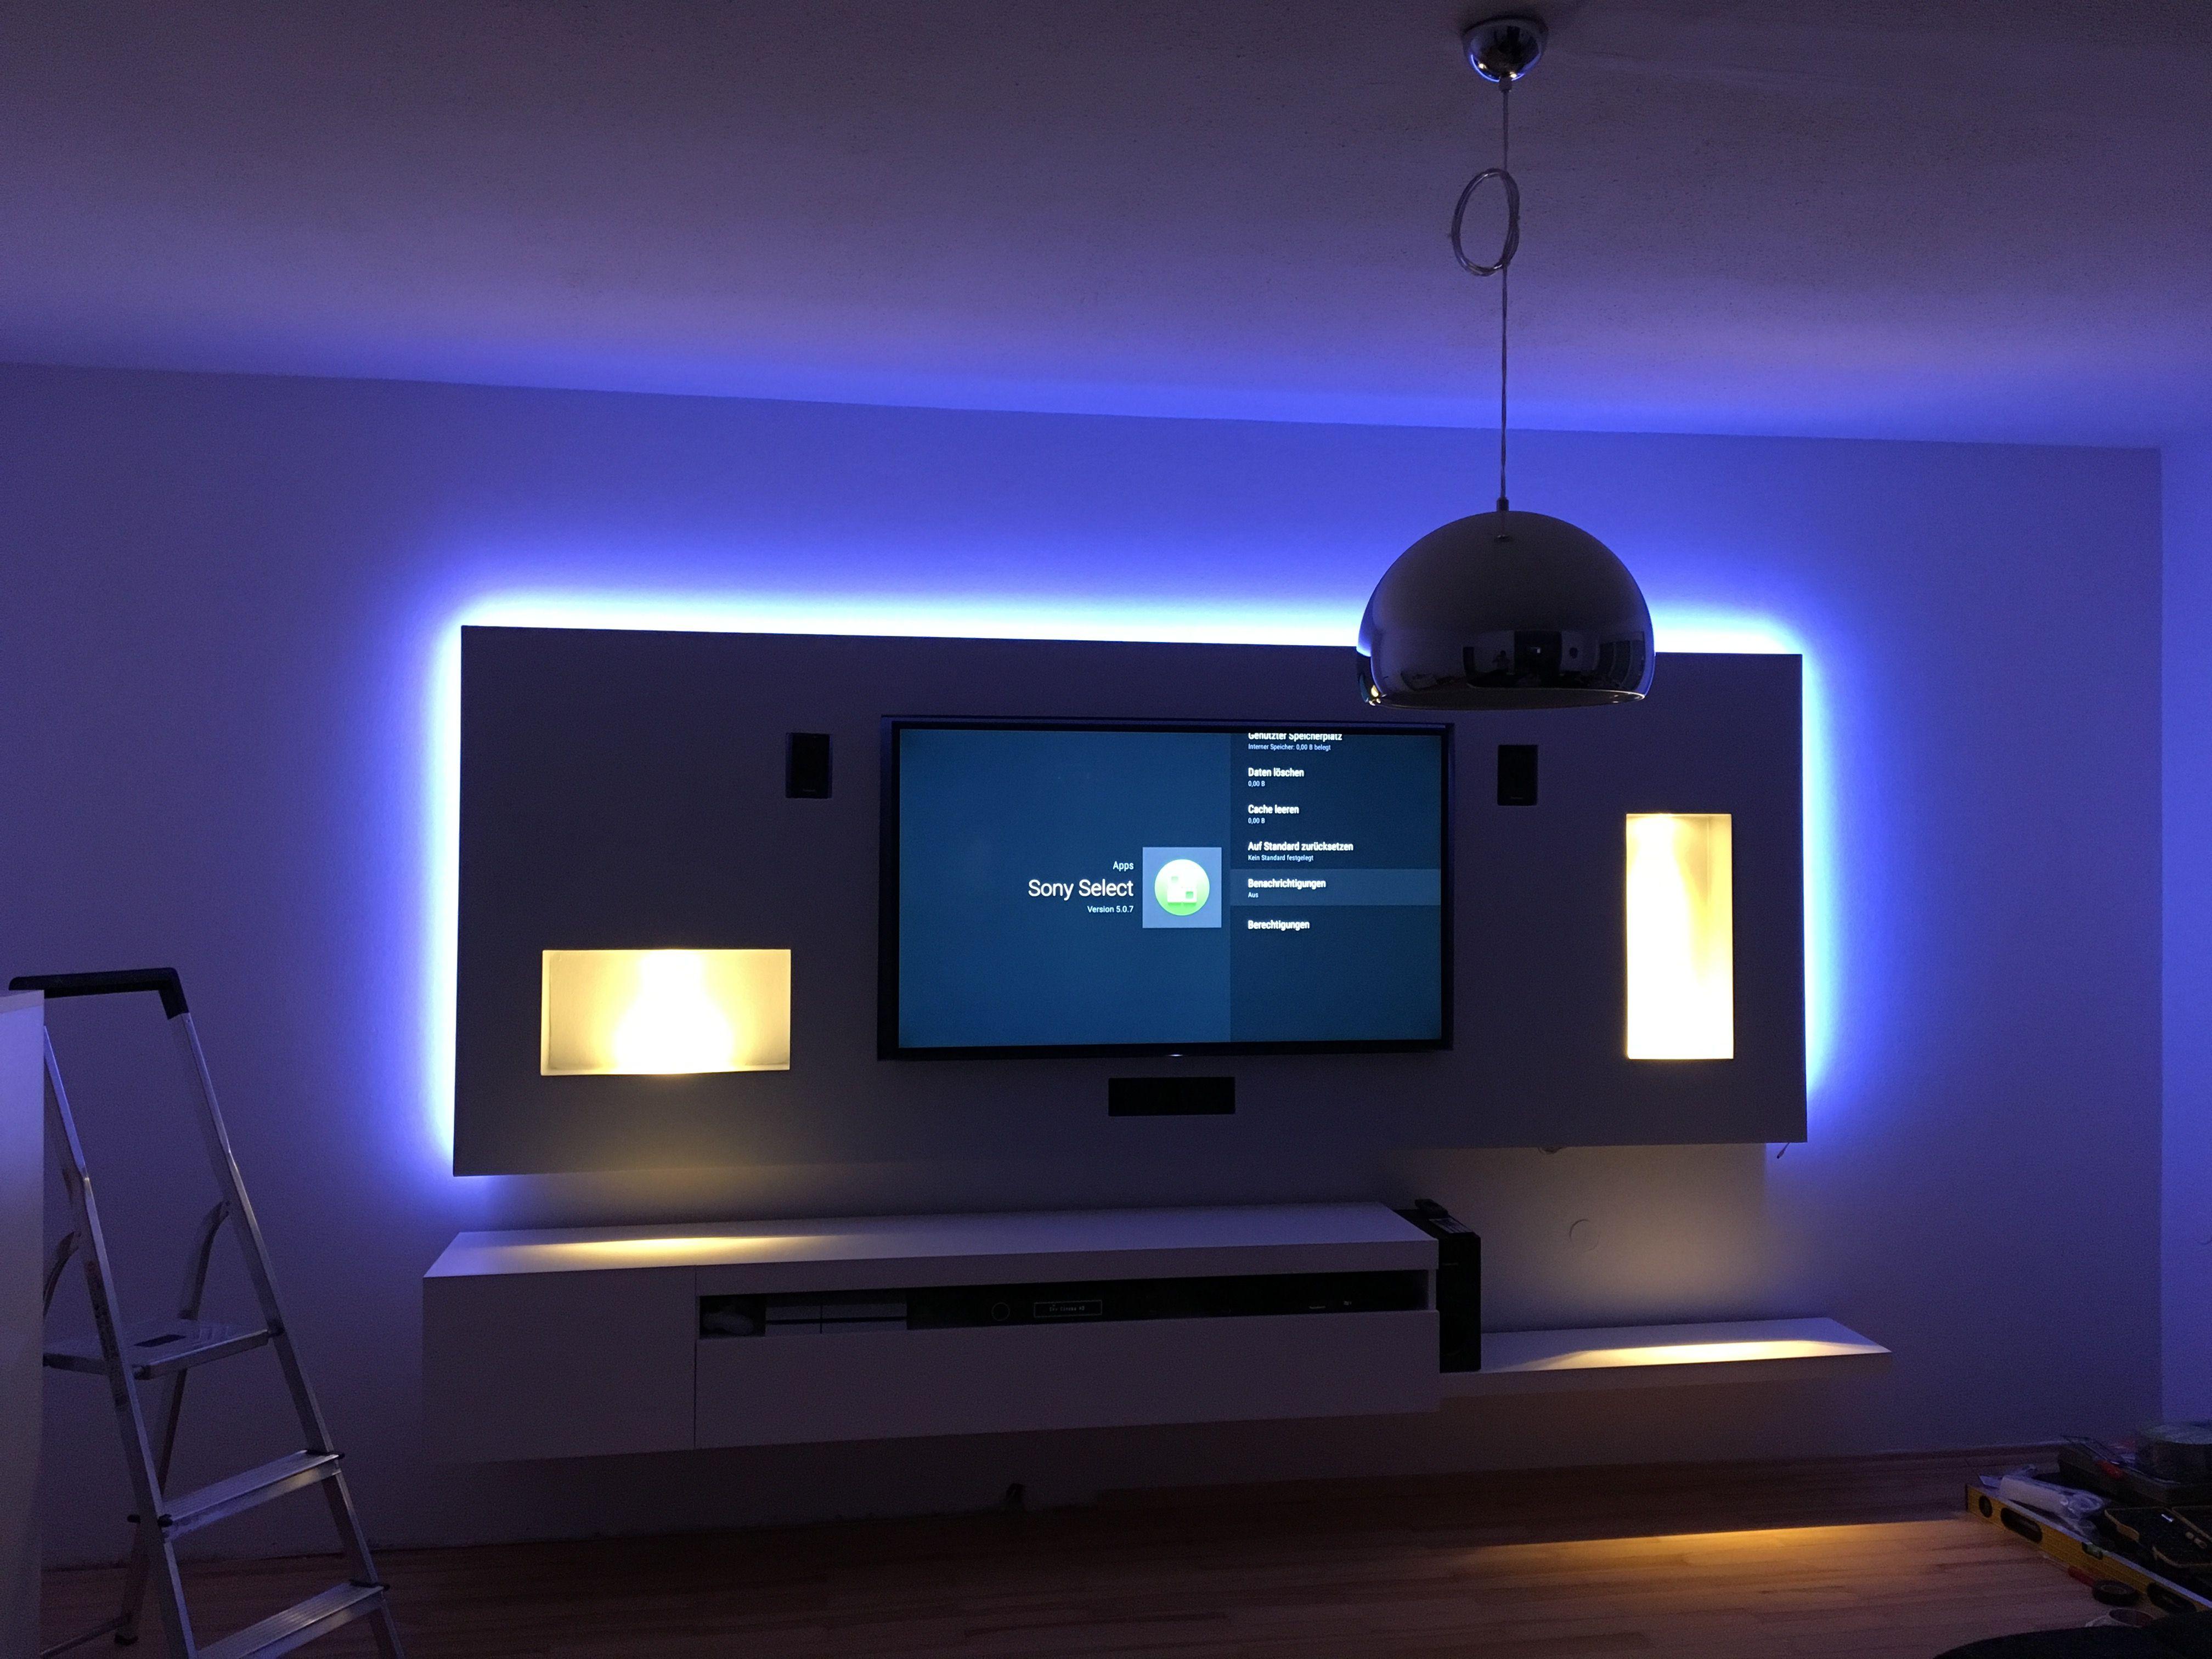 Multimediawand Wohnwand Wall Led Homecinema Wohnwand Ideen Wohnwand Wohnen